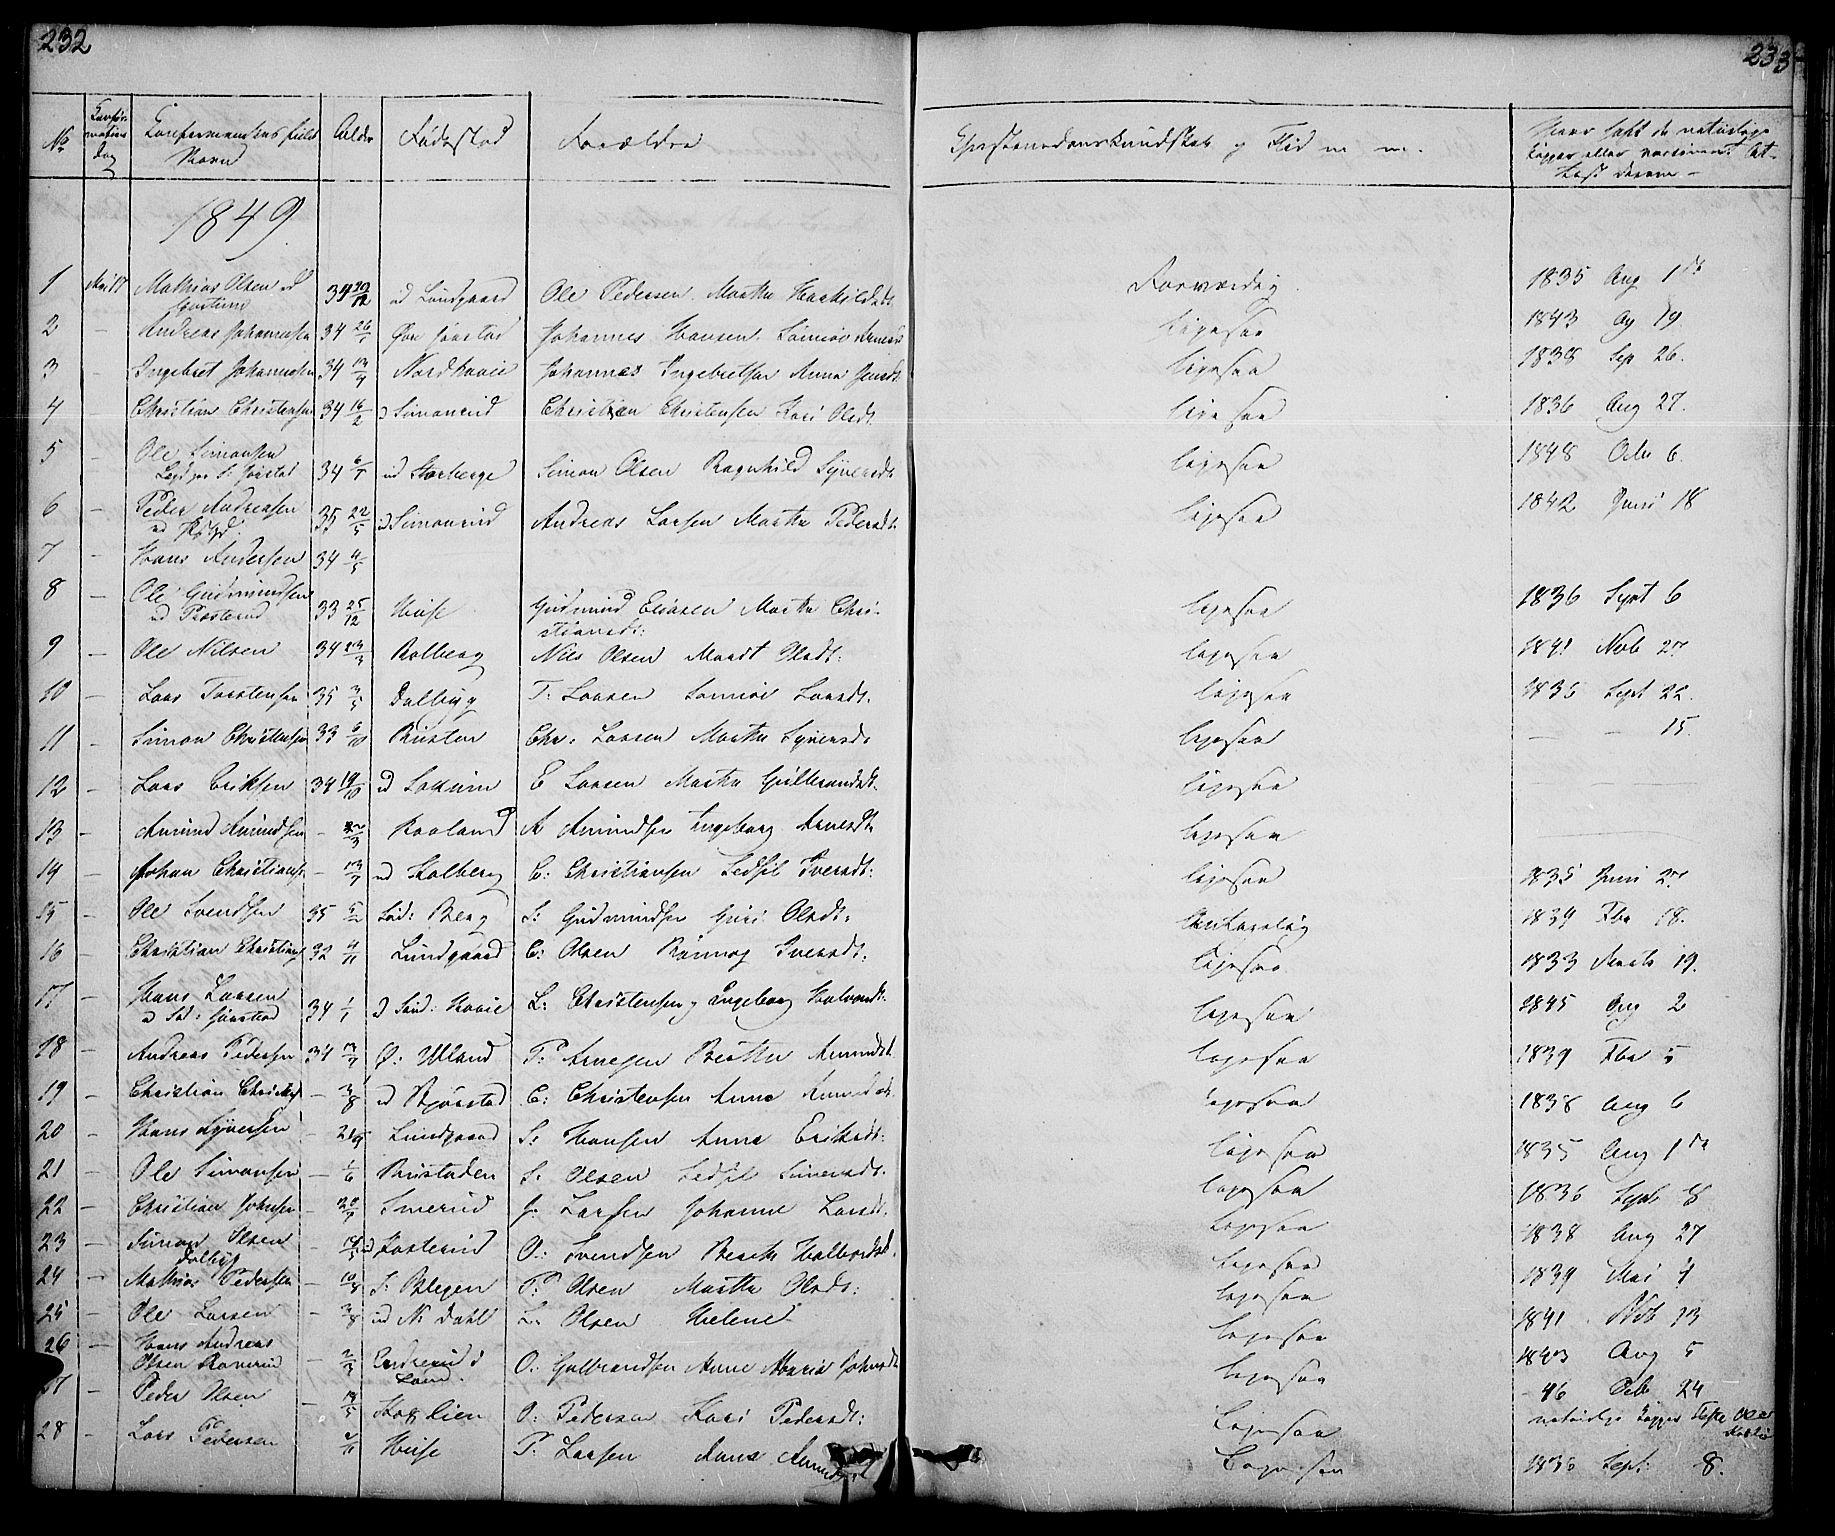 SAH, Fåberg prestekontor, Klokkerbok nr. 5, 1837-1864, s. 232-233